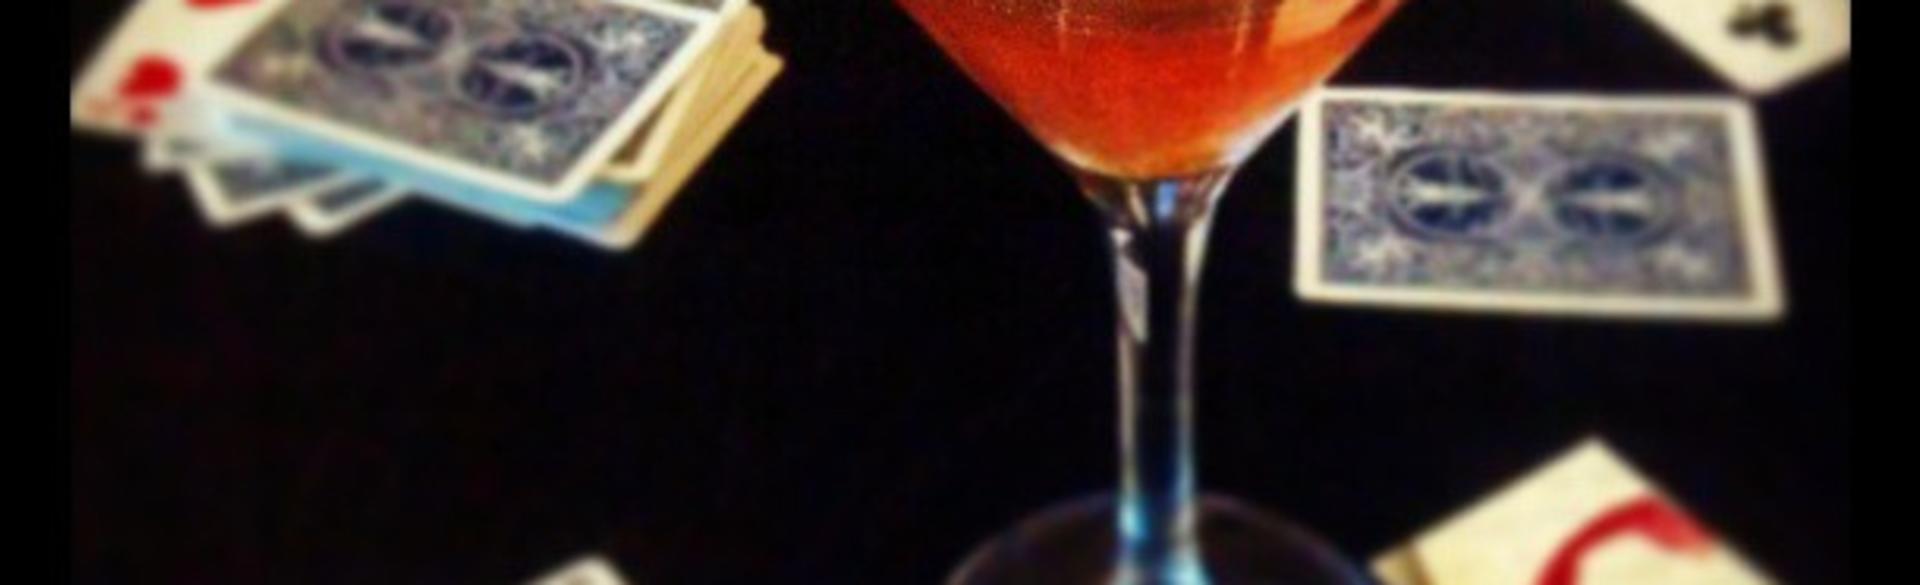 SpeakEZ Grand Cocktail Entry